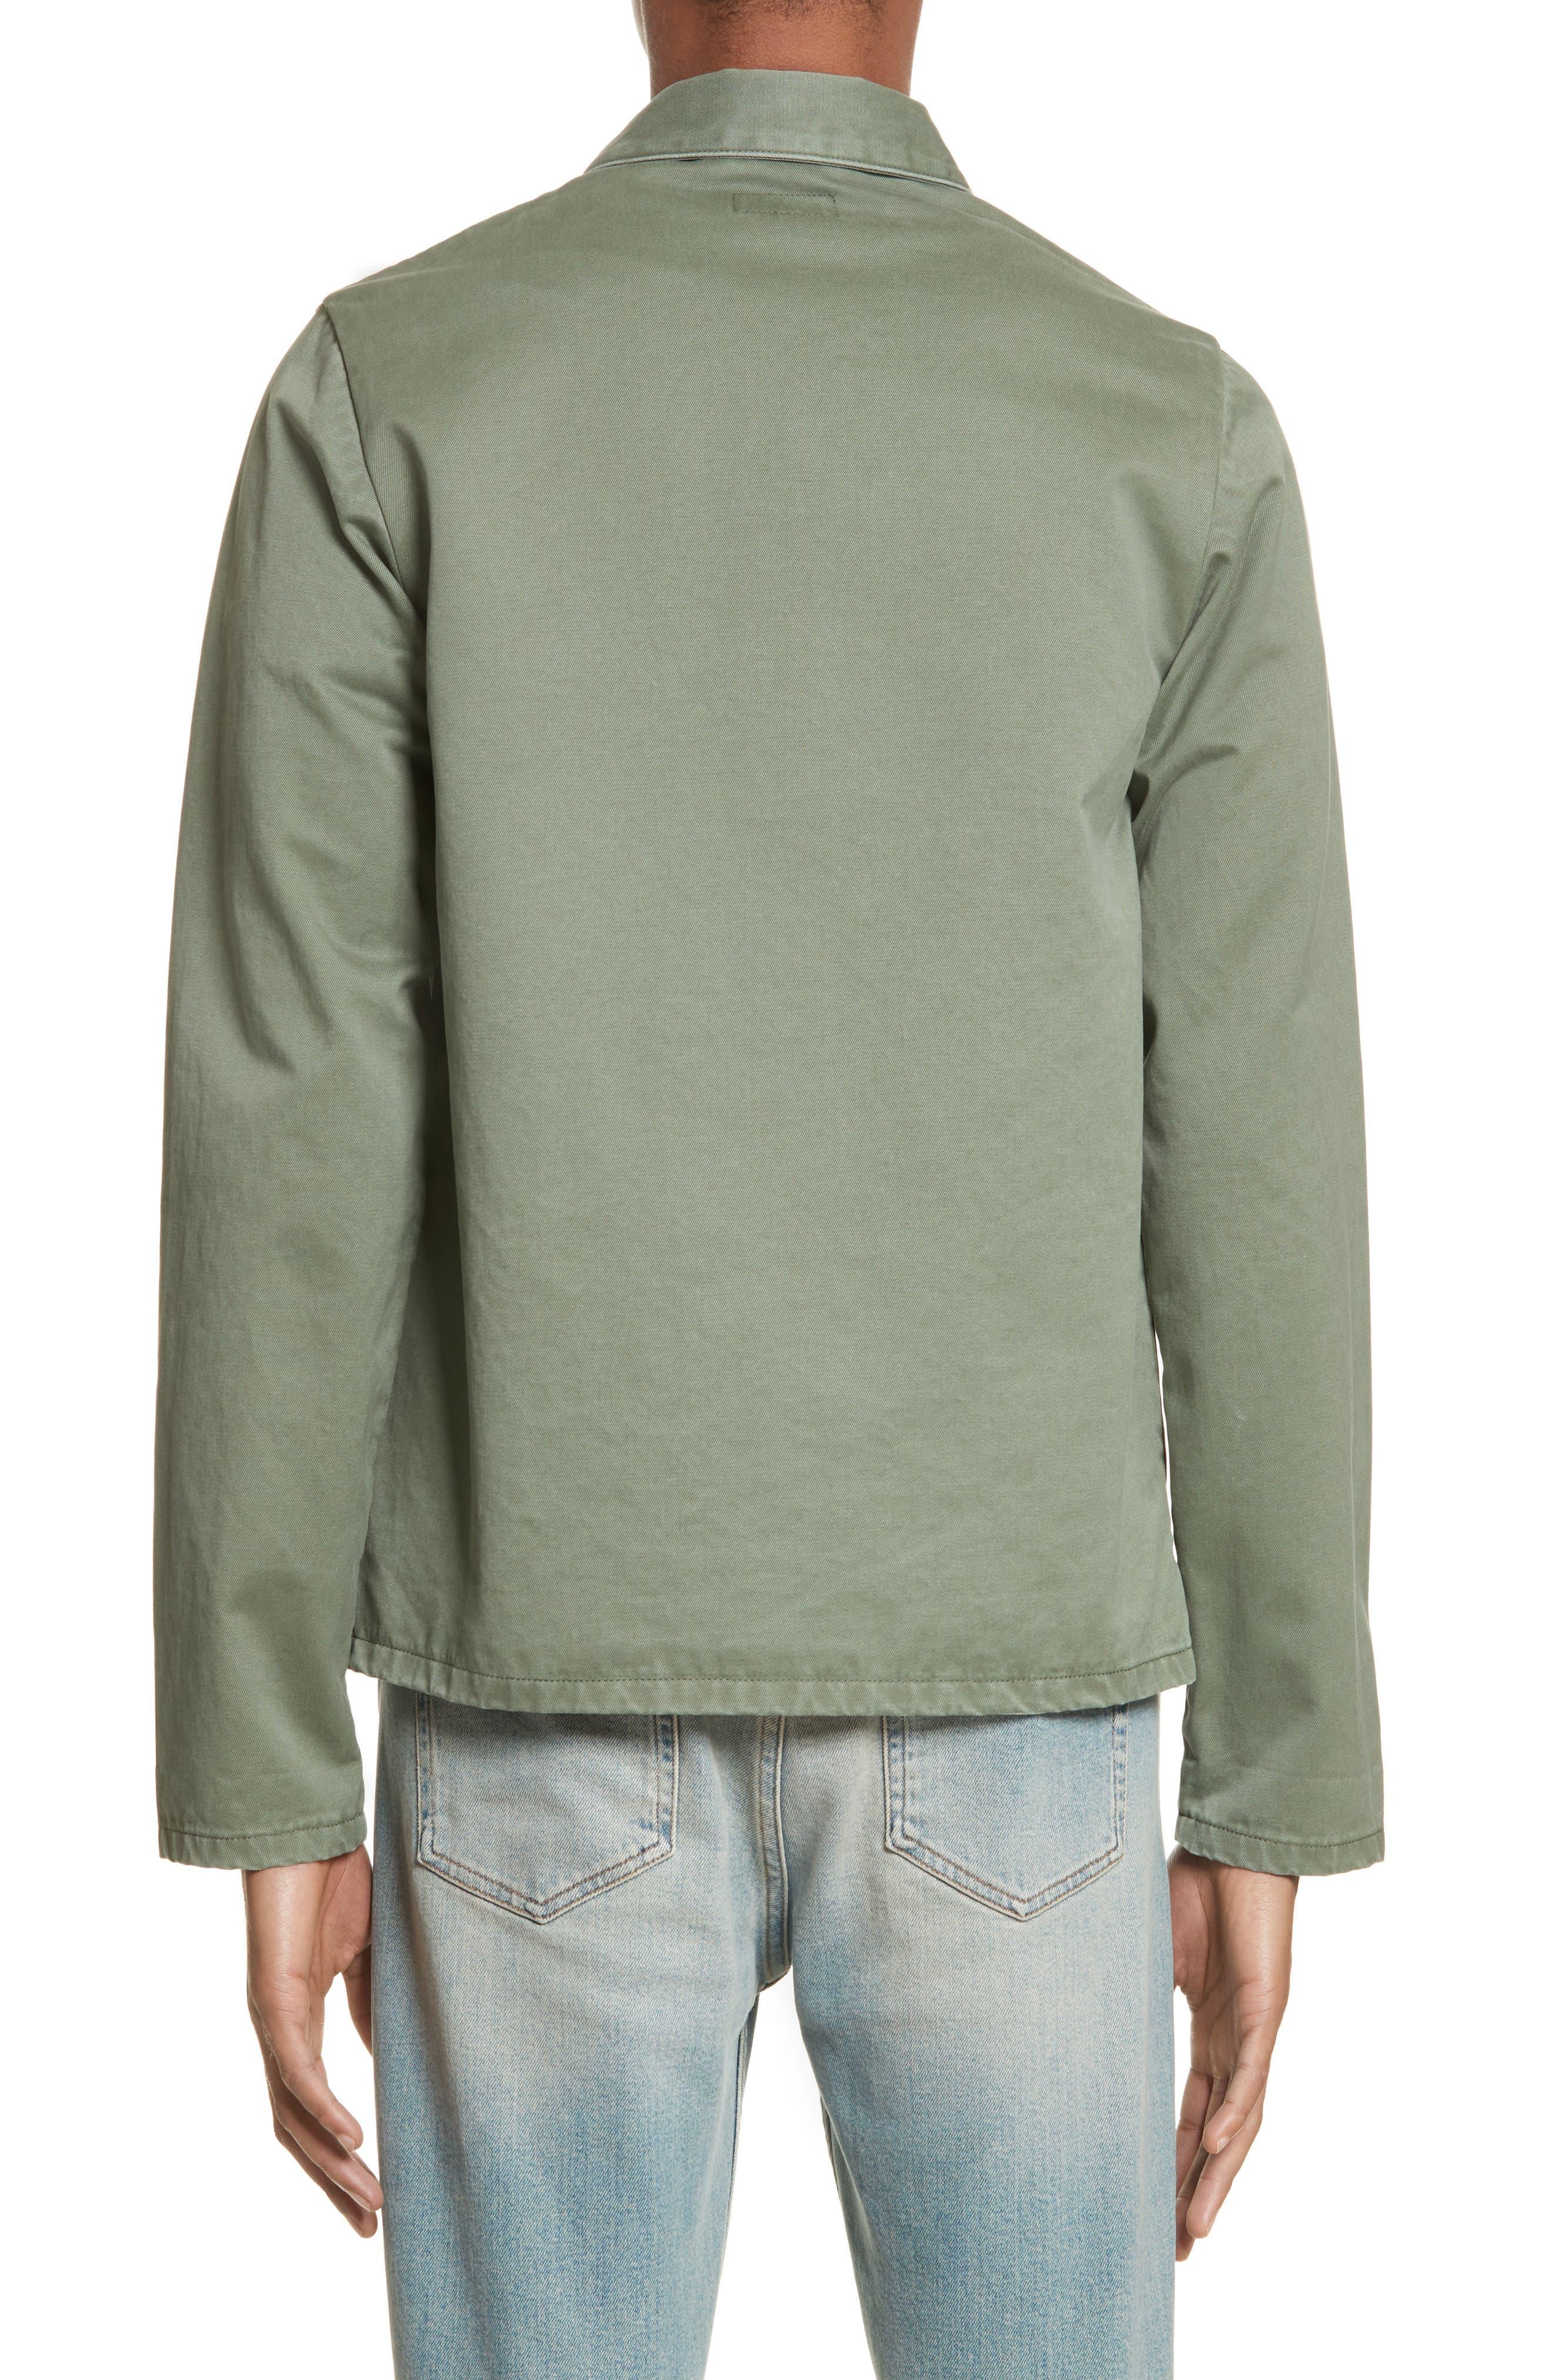 Kerlouan Shirt Jacket,                             Alternate thumbnail 2, color,